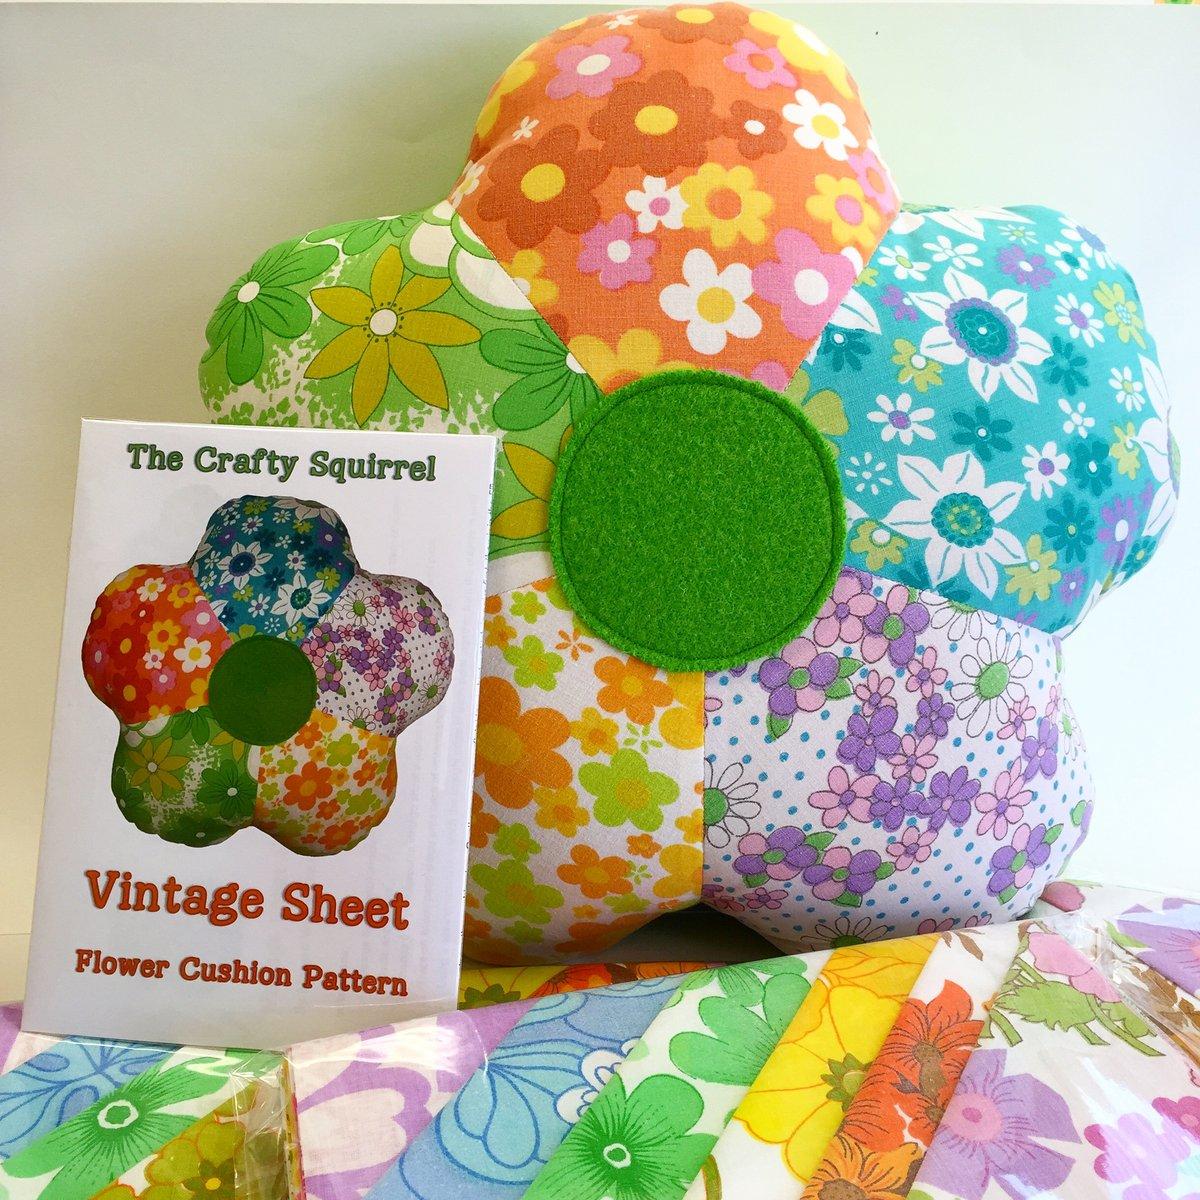 Image of Flower cushion pattern